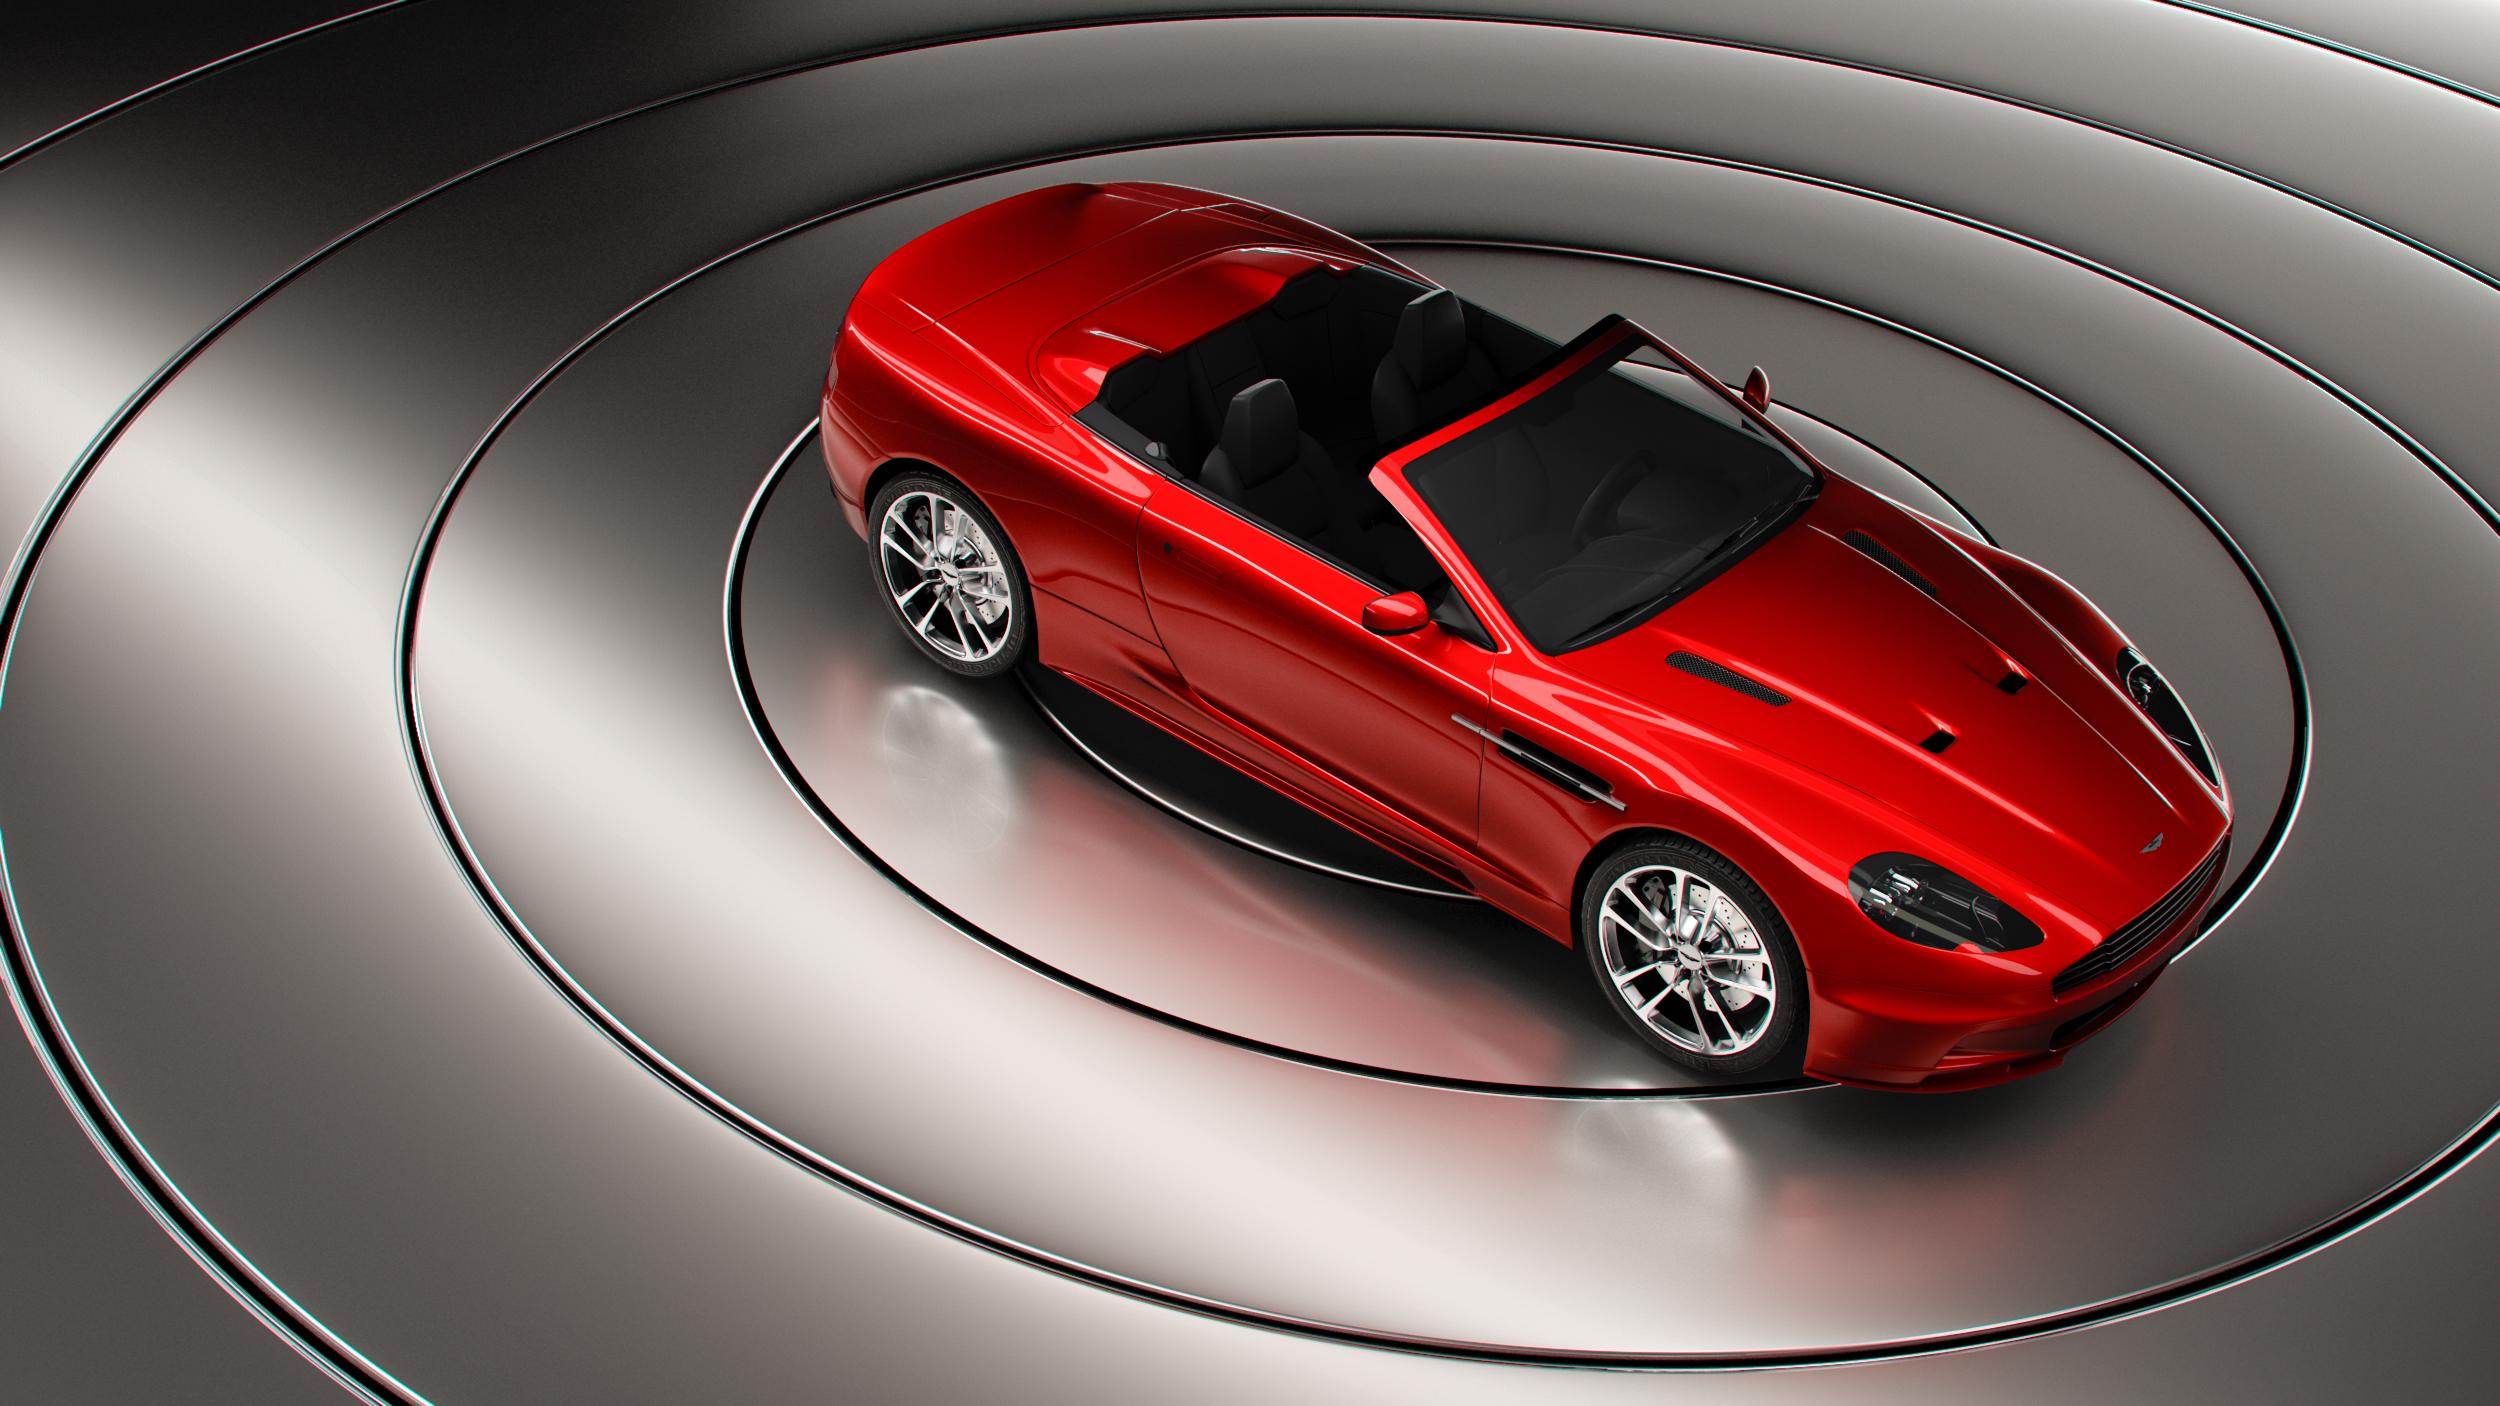 Aston Martin Volante Red.jpg